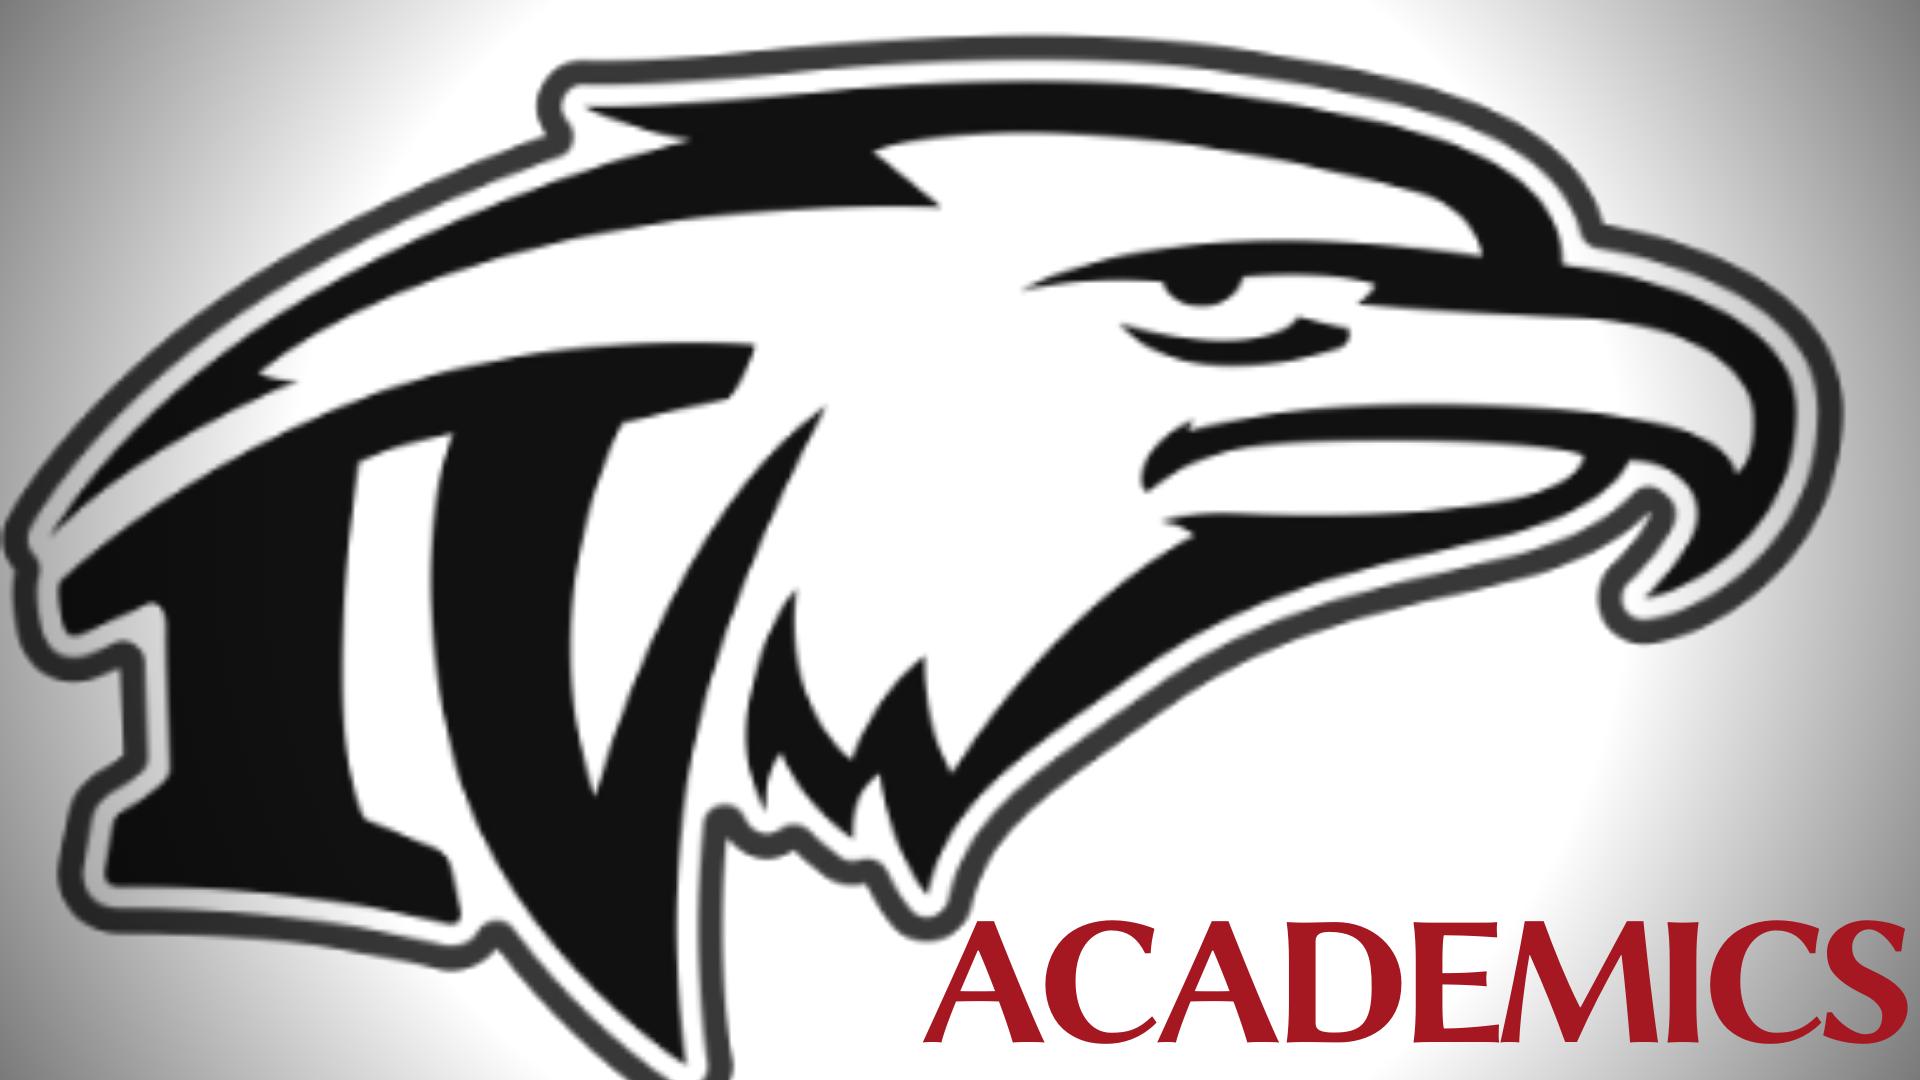 IVAS Academics